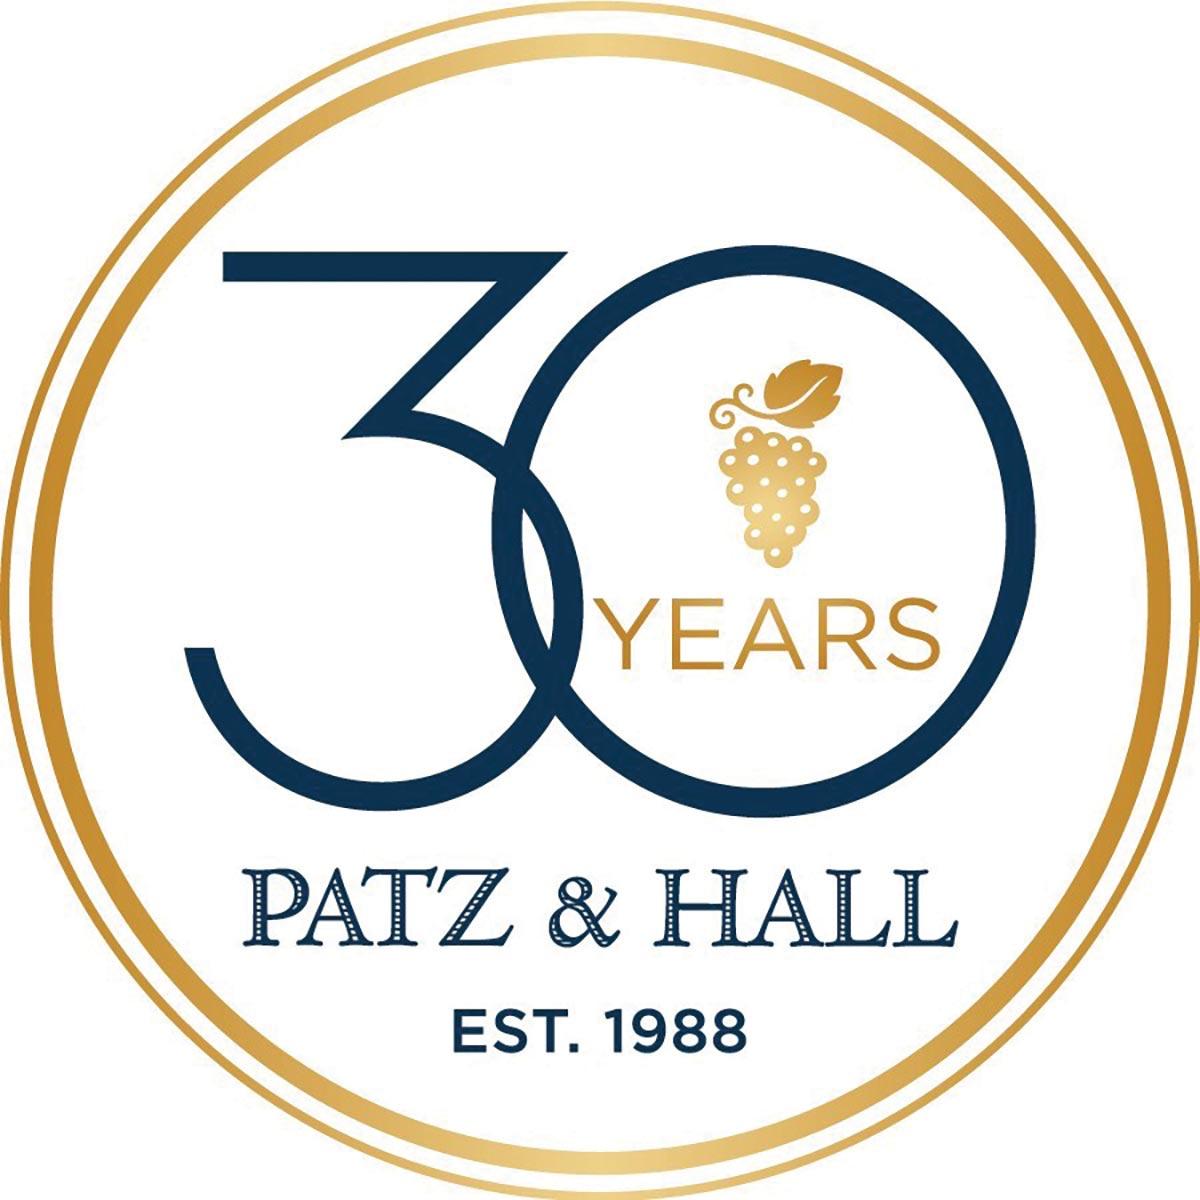 California's Patz & Hall Celebrates 30 Years